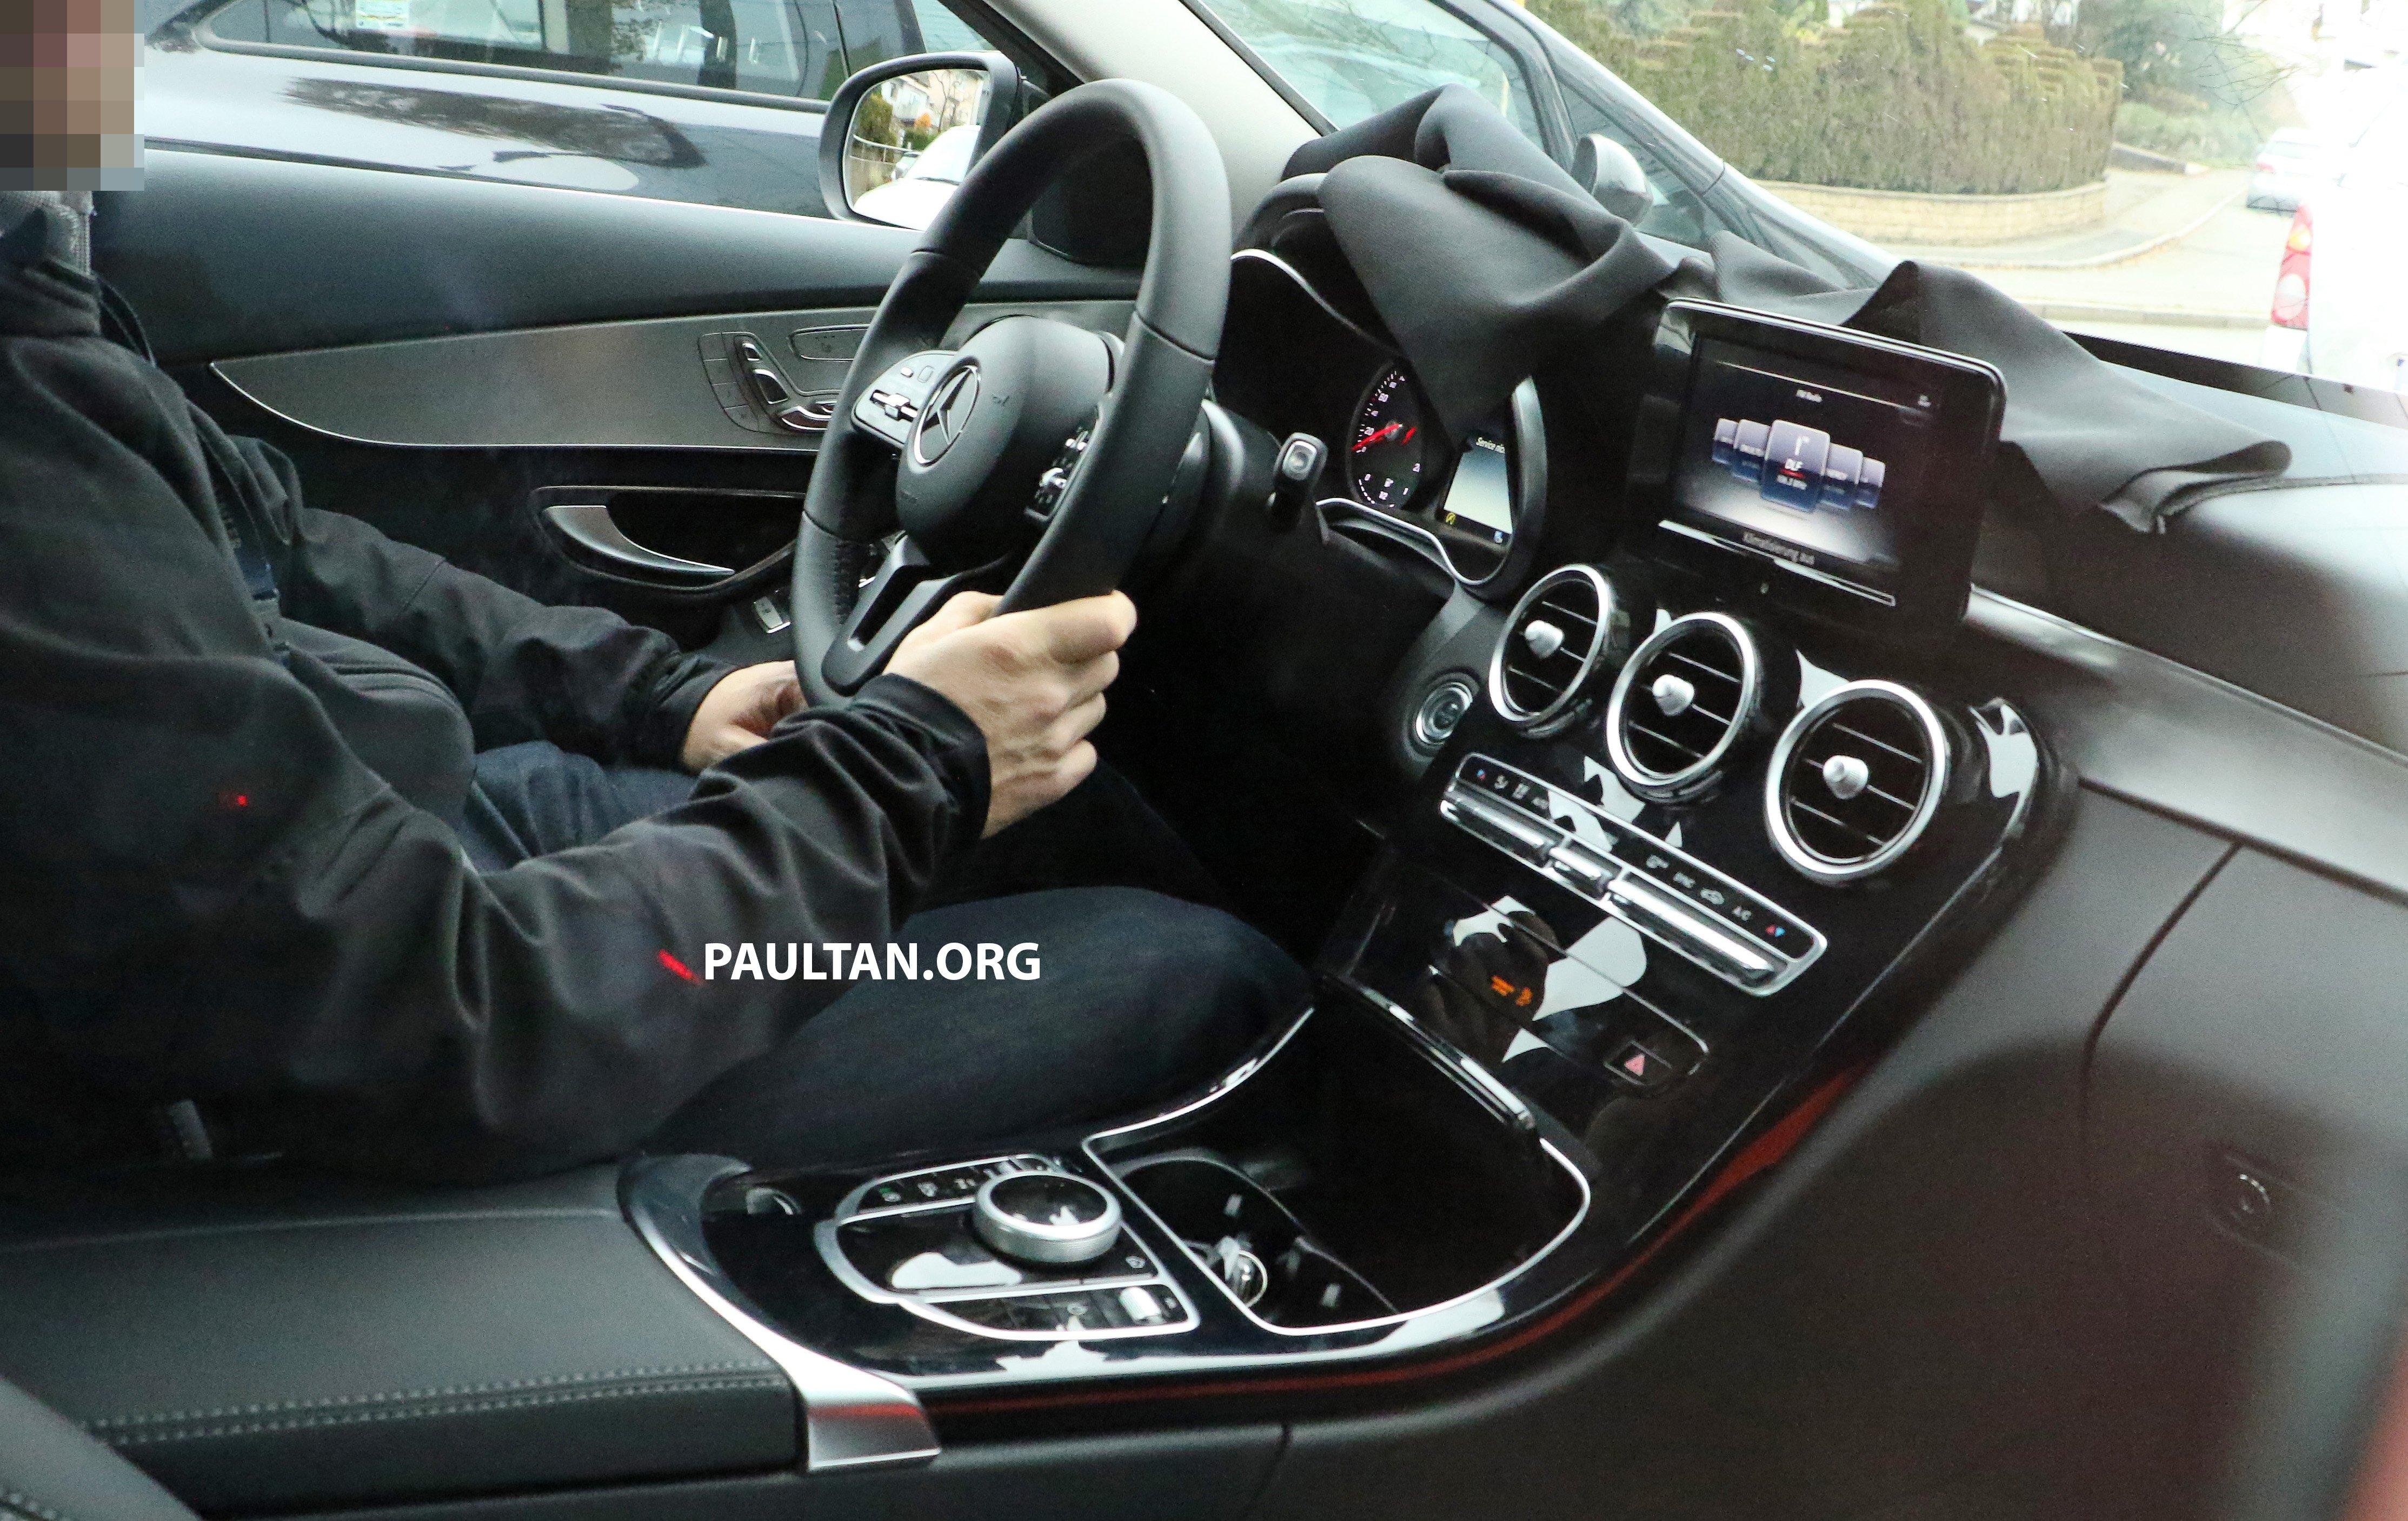 Spied W205 Mercedes C Class Facelift Interior Seen